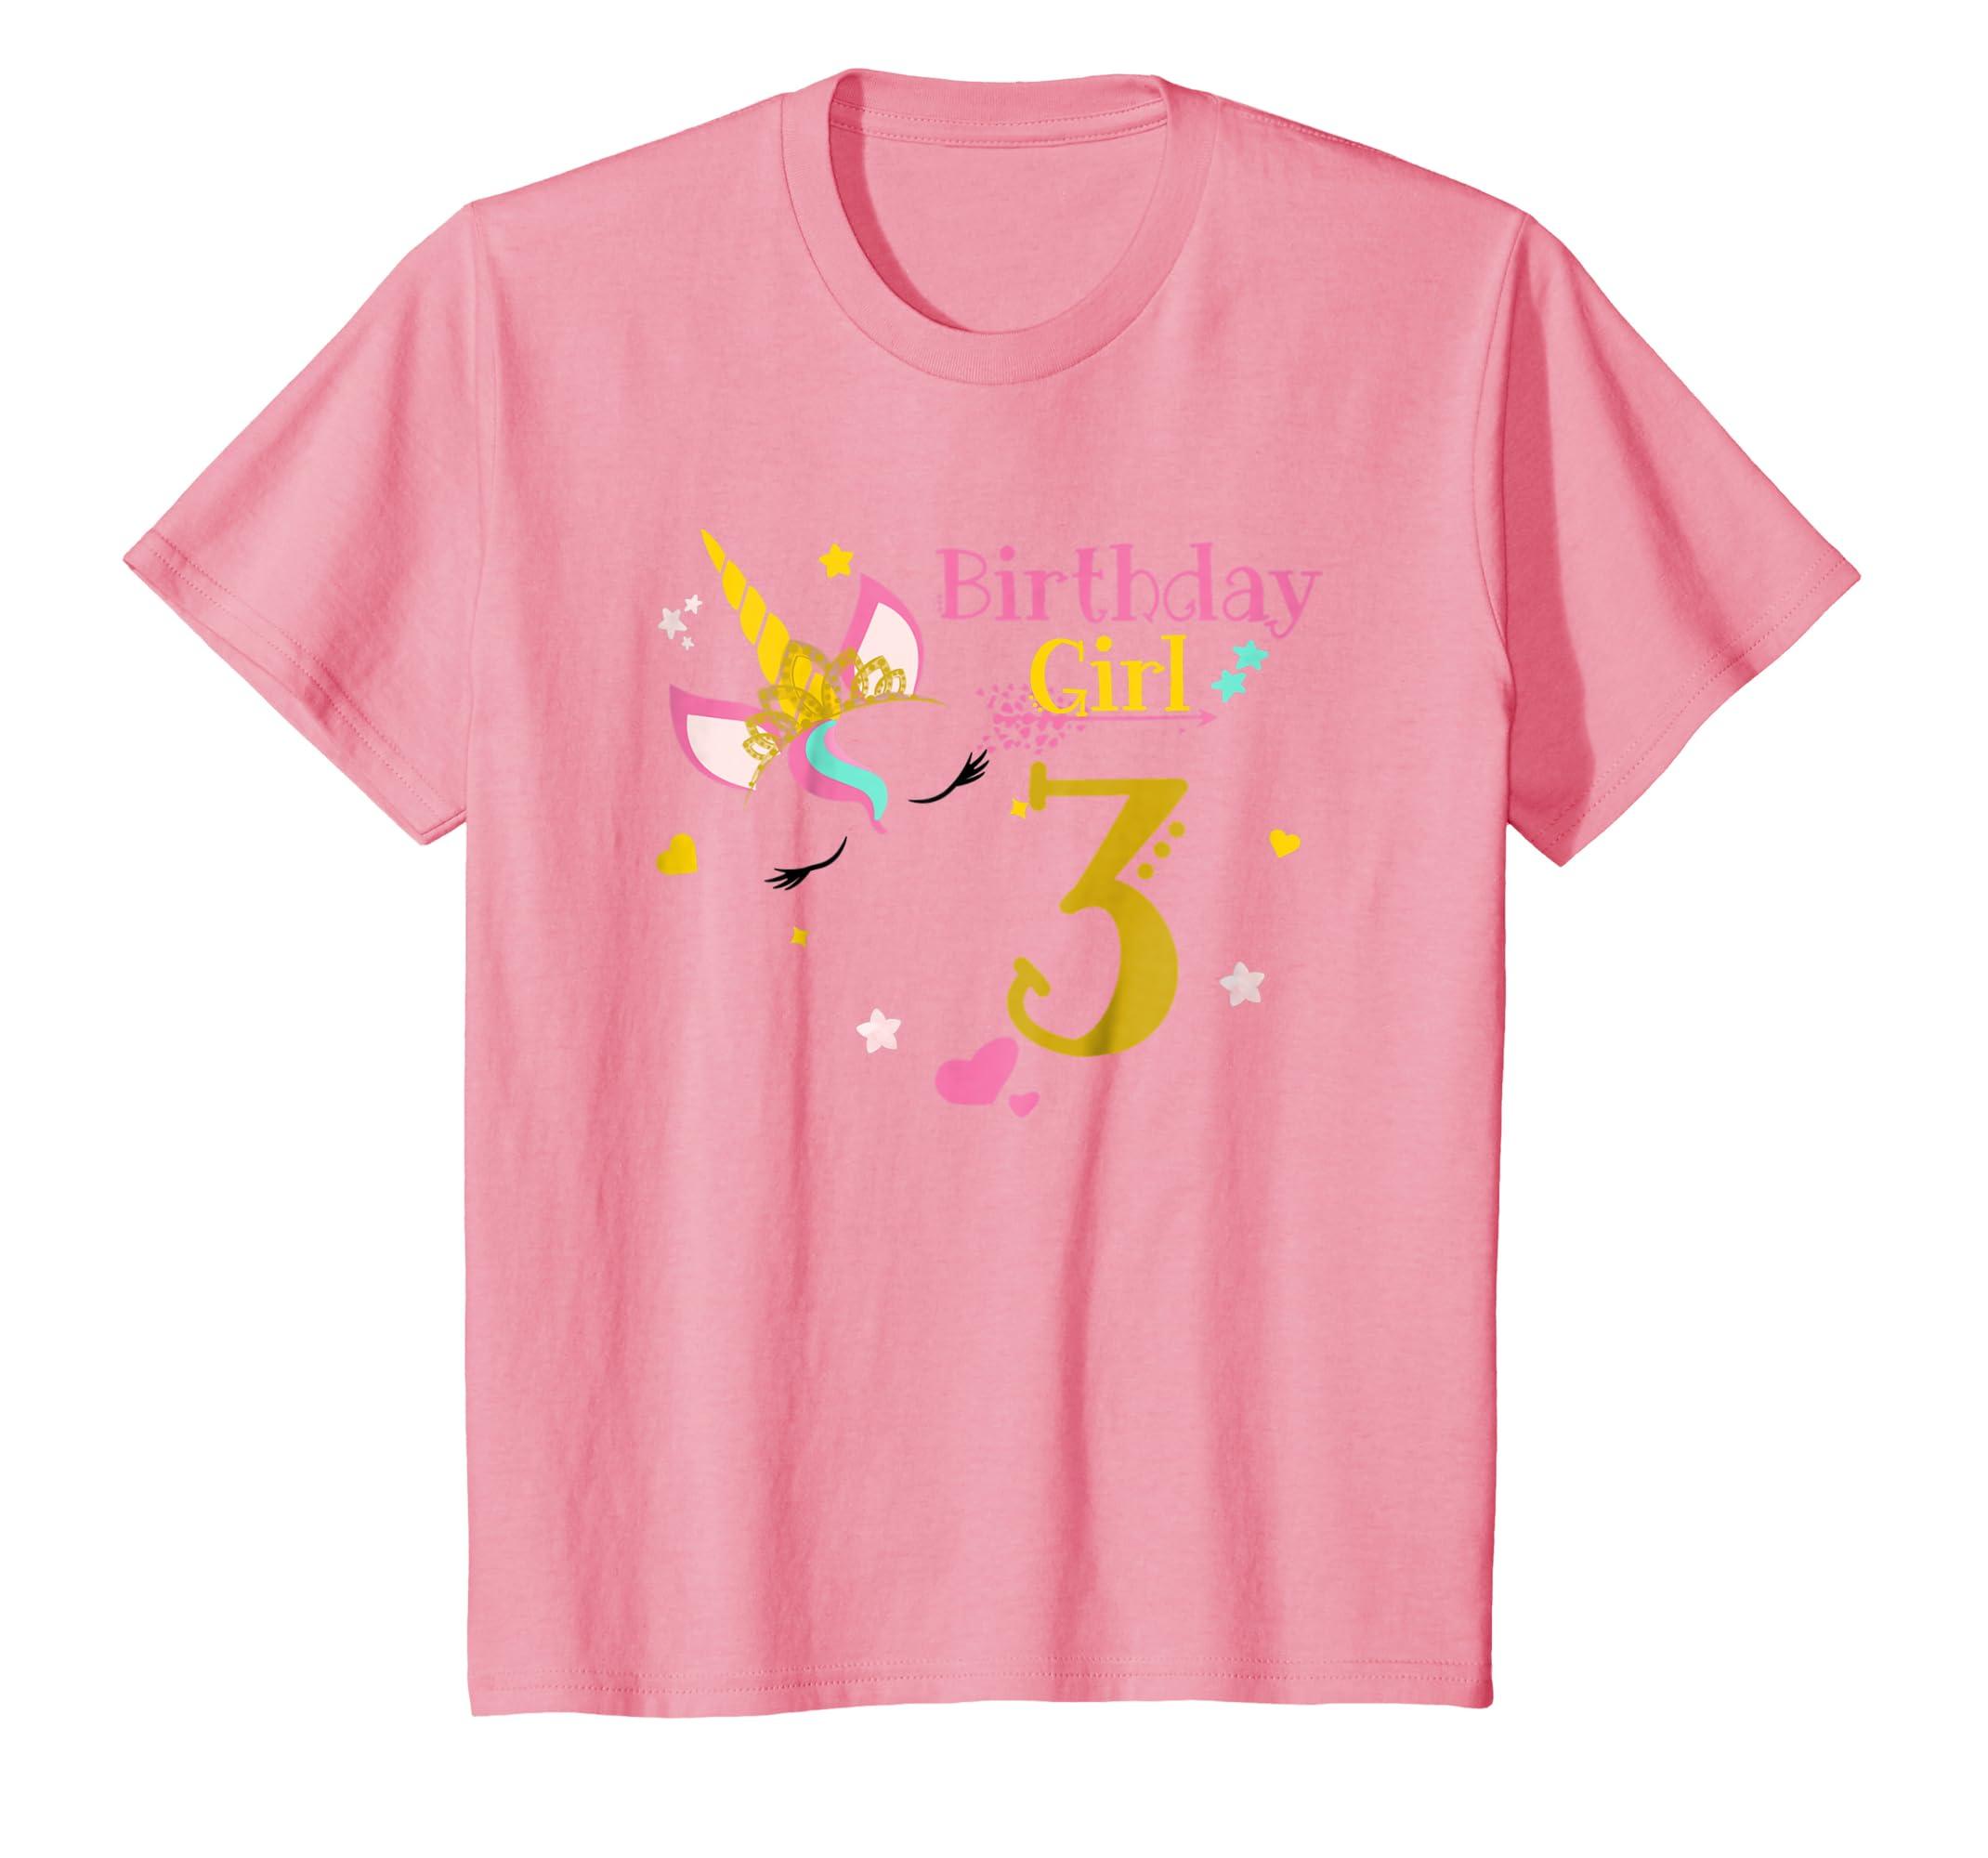 Amazon Kids Unicorn 3rd Birthday Shirt Girl T 3 Yrs Clothing